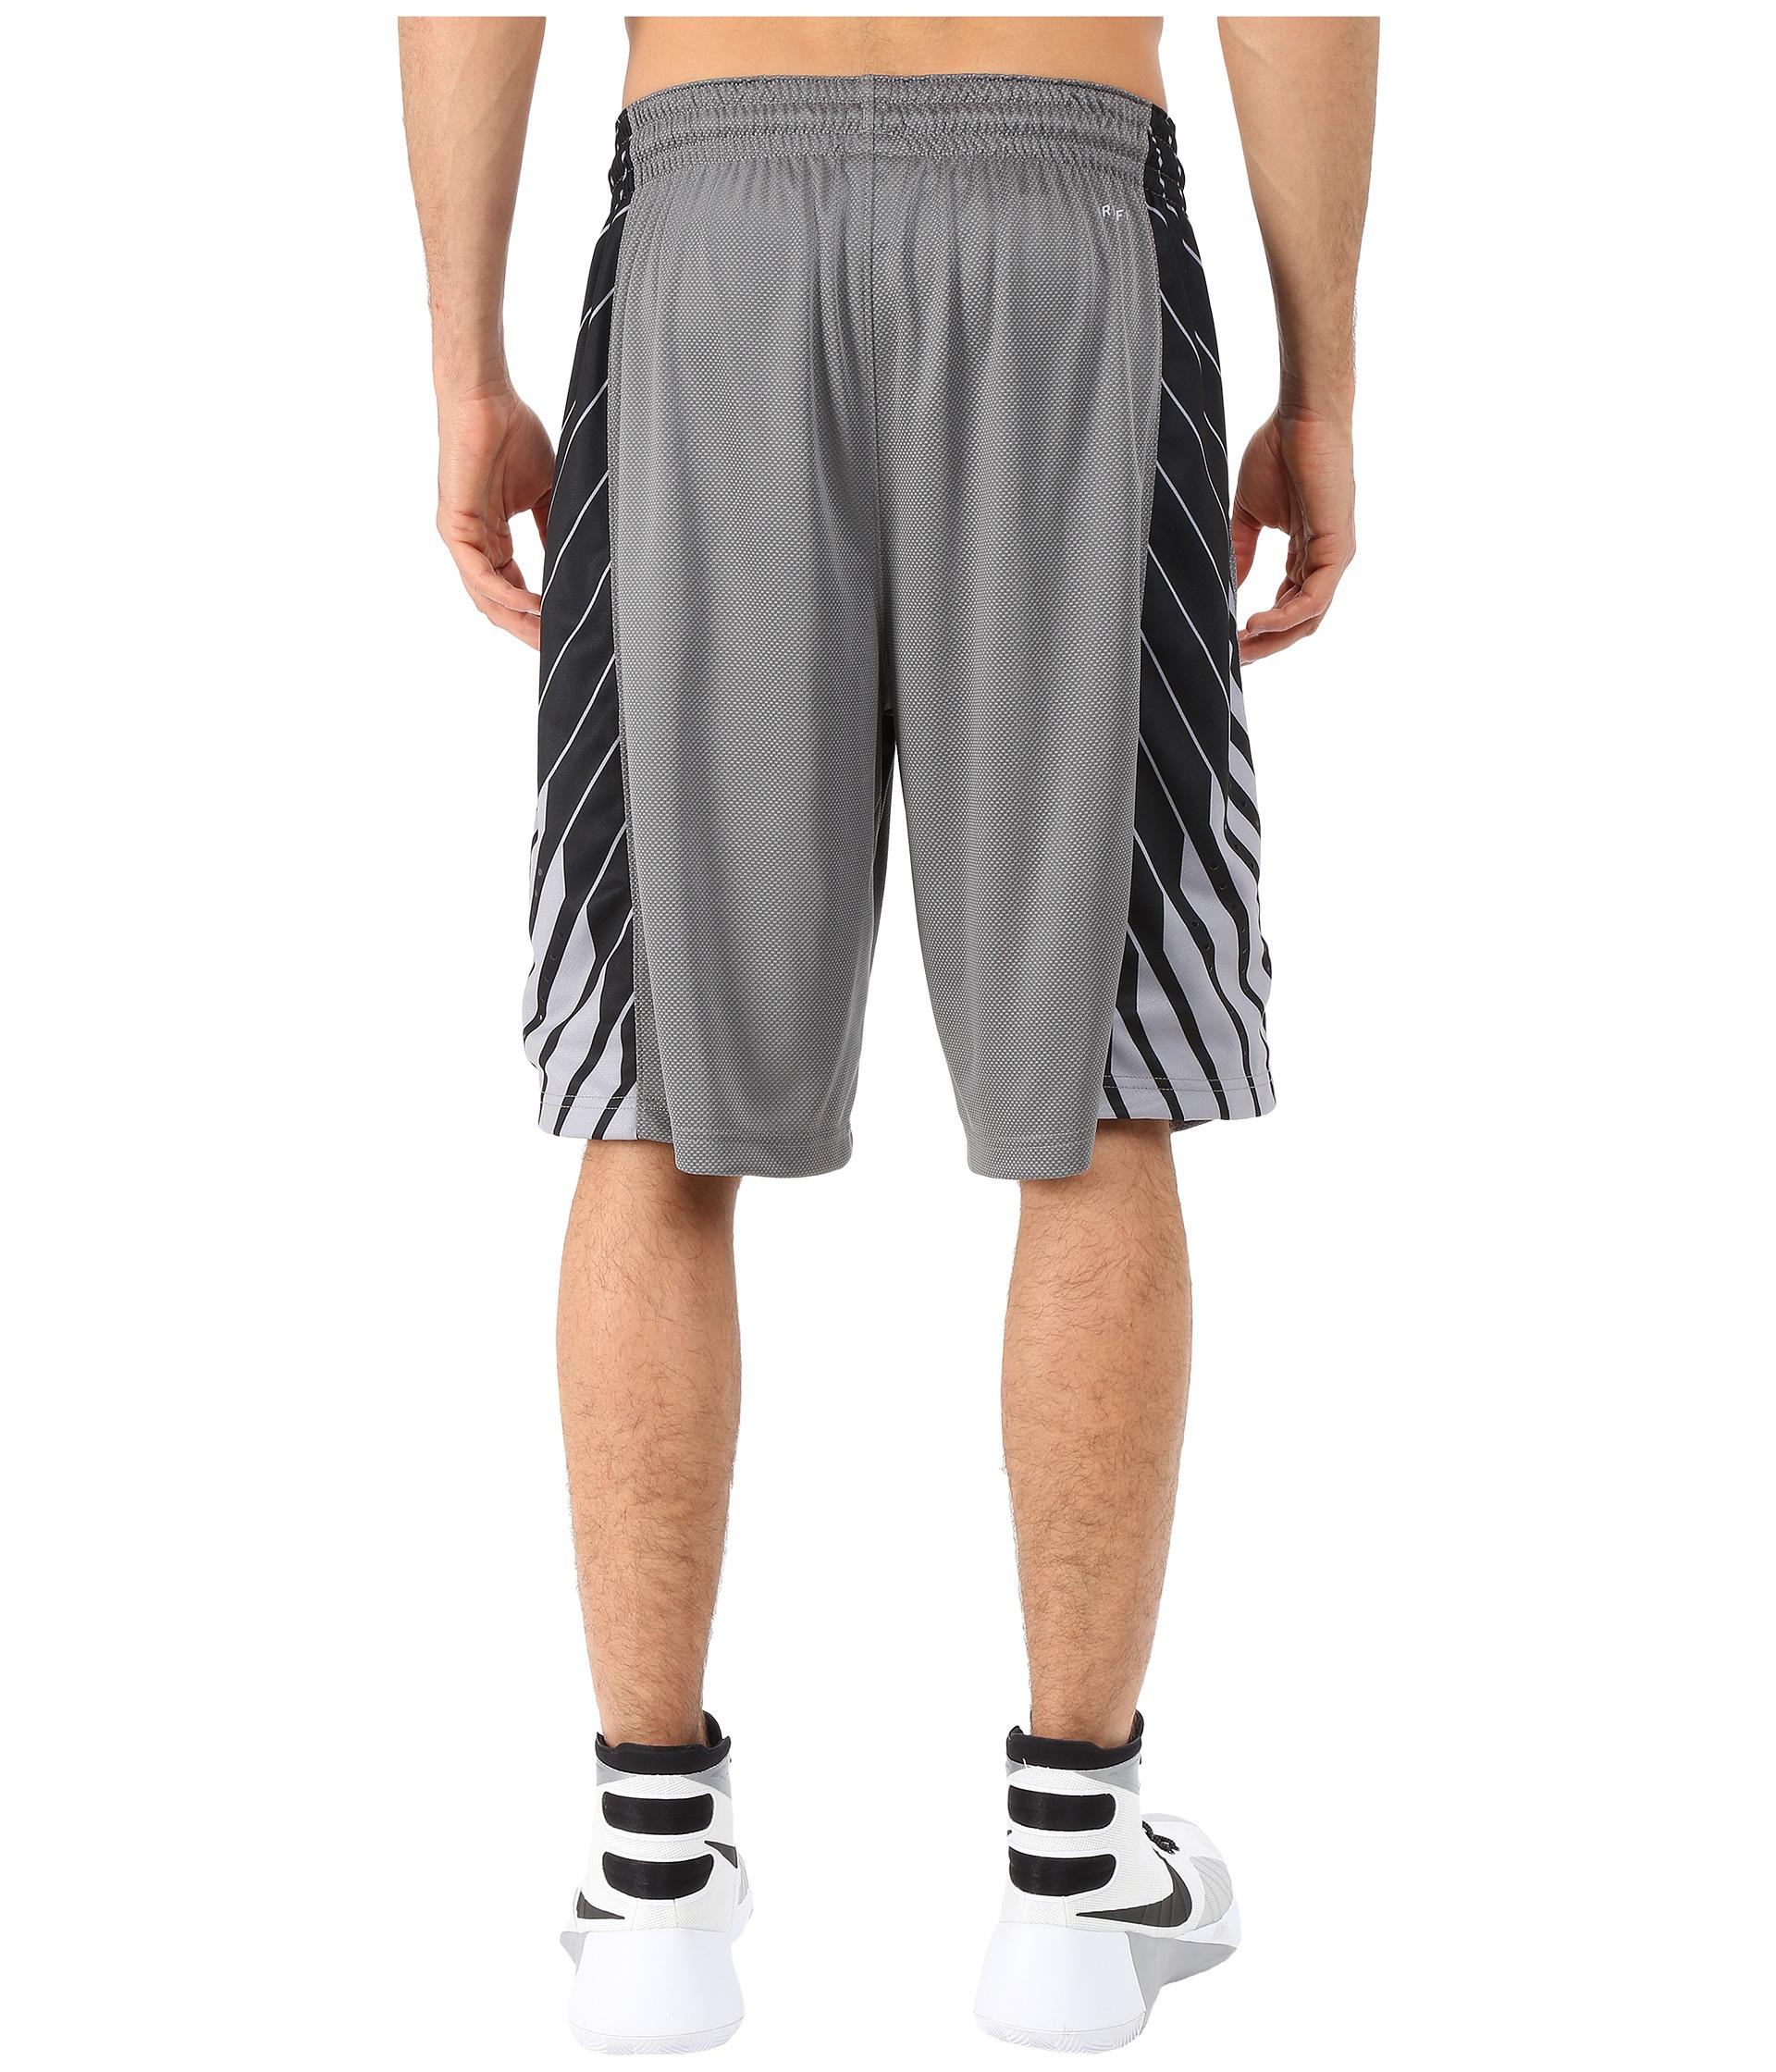 Power Up Shorts